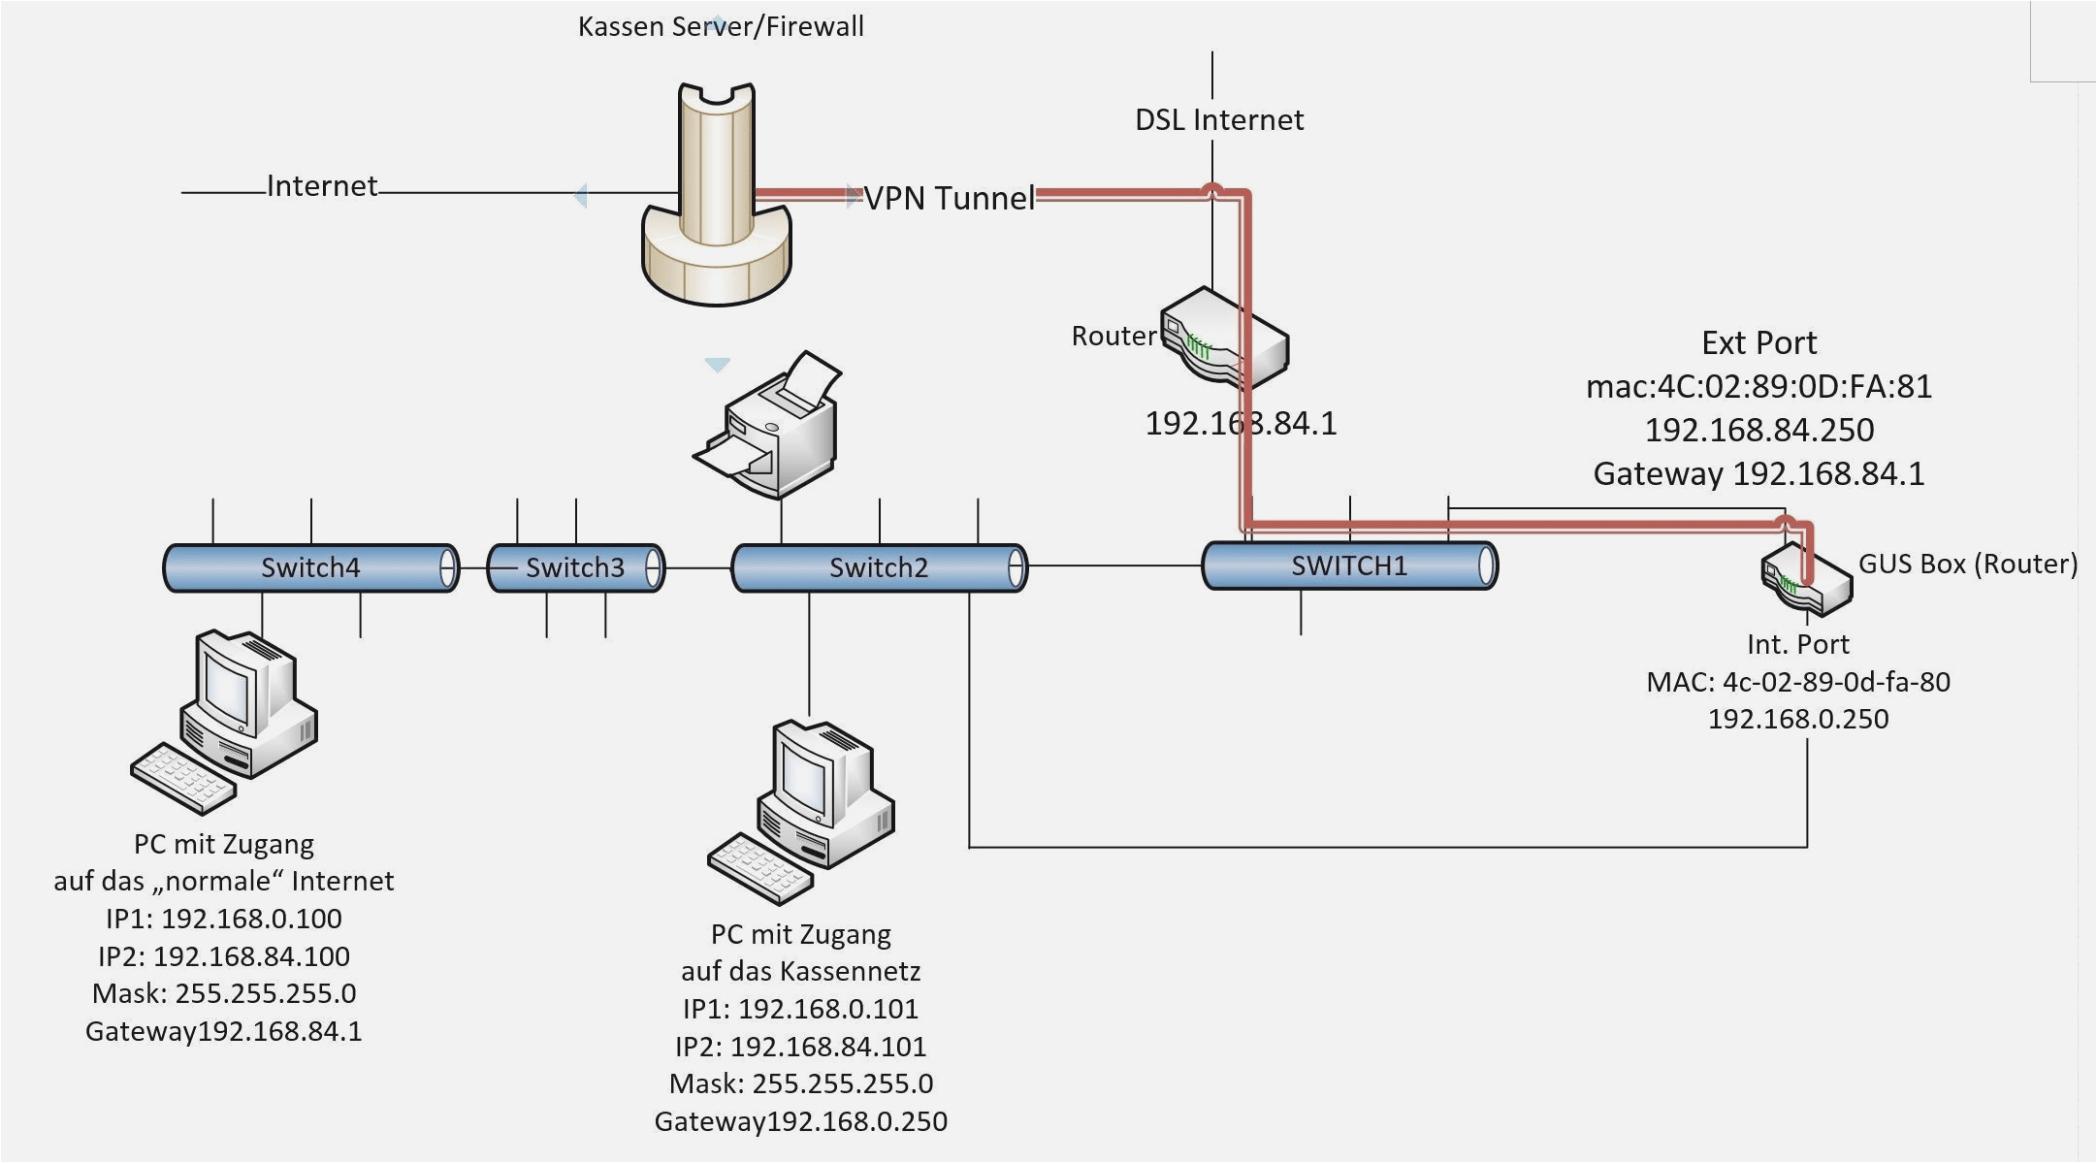 fixture wiring diagram 110v 230v circuit diagram wiring diagram fixture wiring diagram 110v 230v